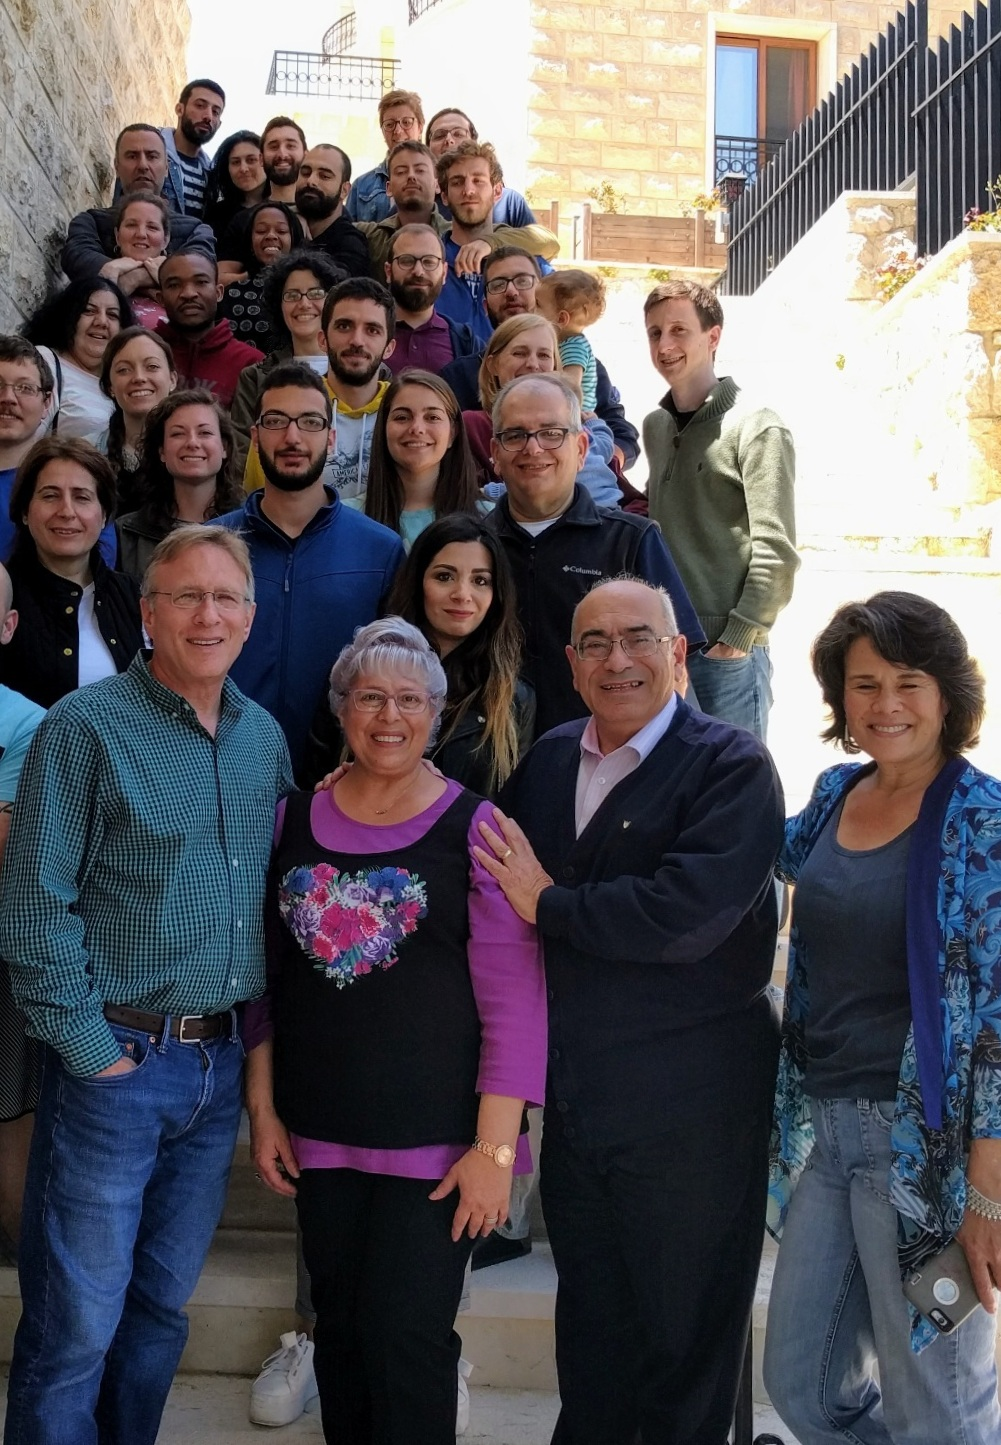 Lebanon%252Bgroup2.jpg